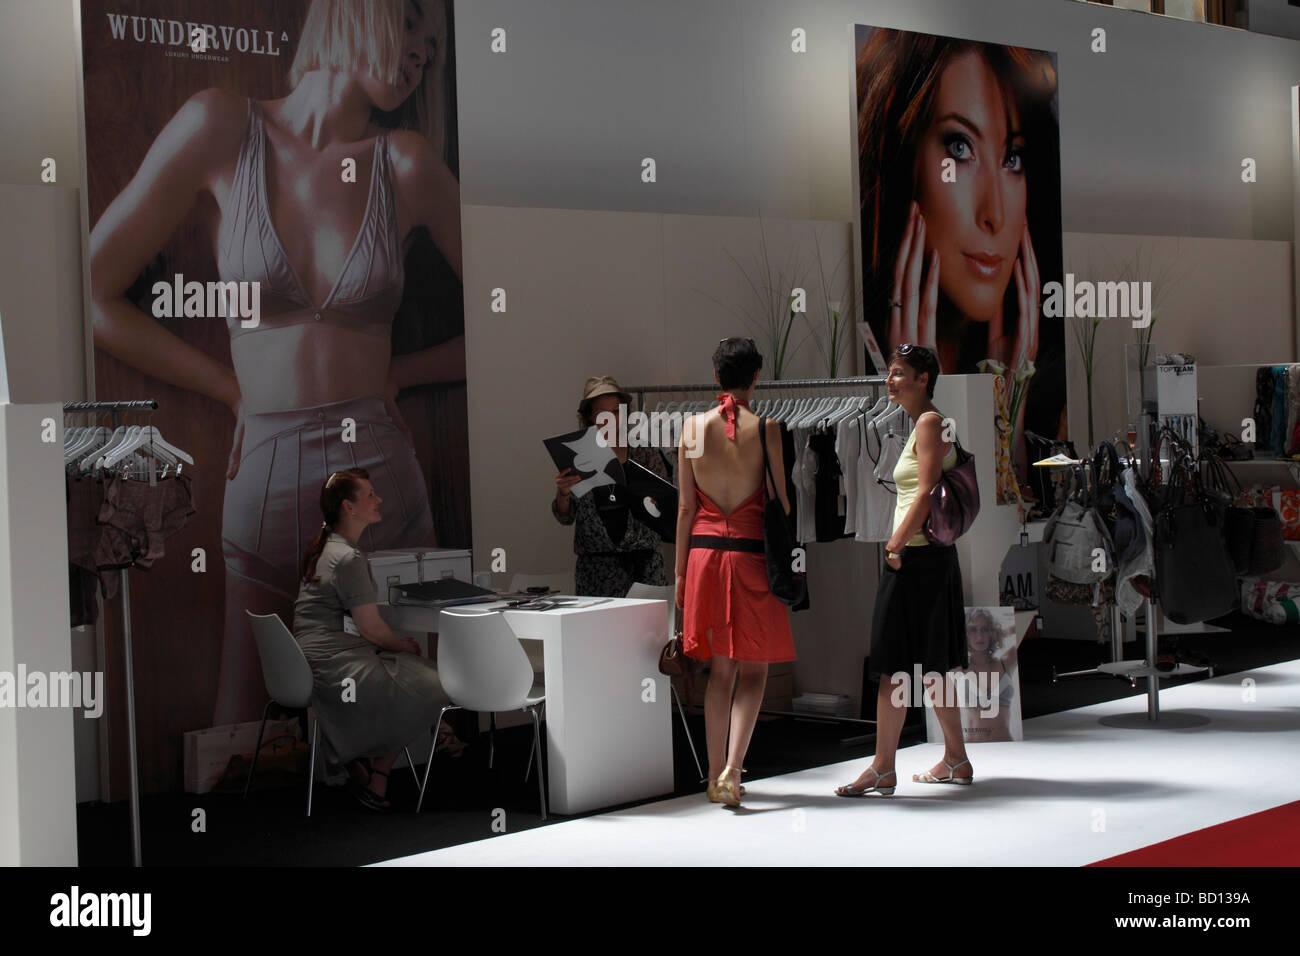 5 elements tradefair for intimate and nightwear in Berlin EU DE DEU FRG Germany capital Berlin The tradefair for - Stock Image